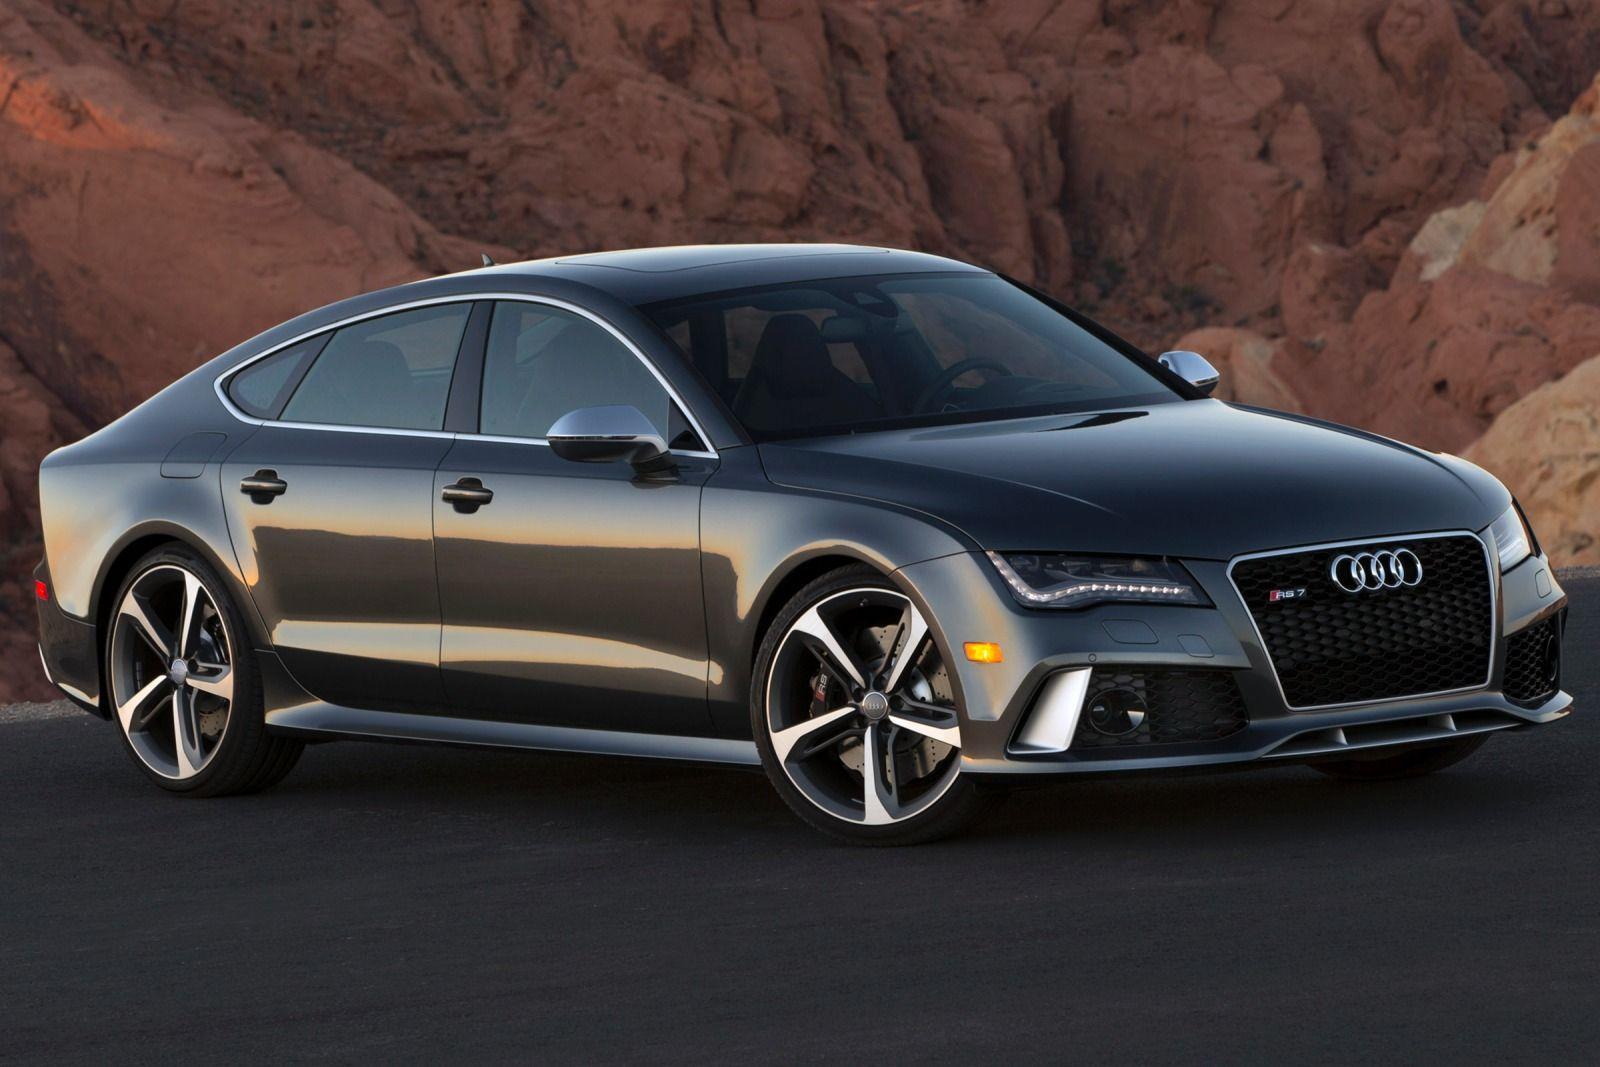 2016_Audi_RS_7_Prestige_quattro_4dr_Sedan_AWD_40L_8cyl_Turbo_8A_5394844.jpg